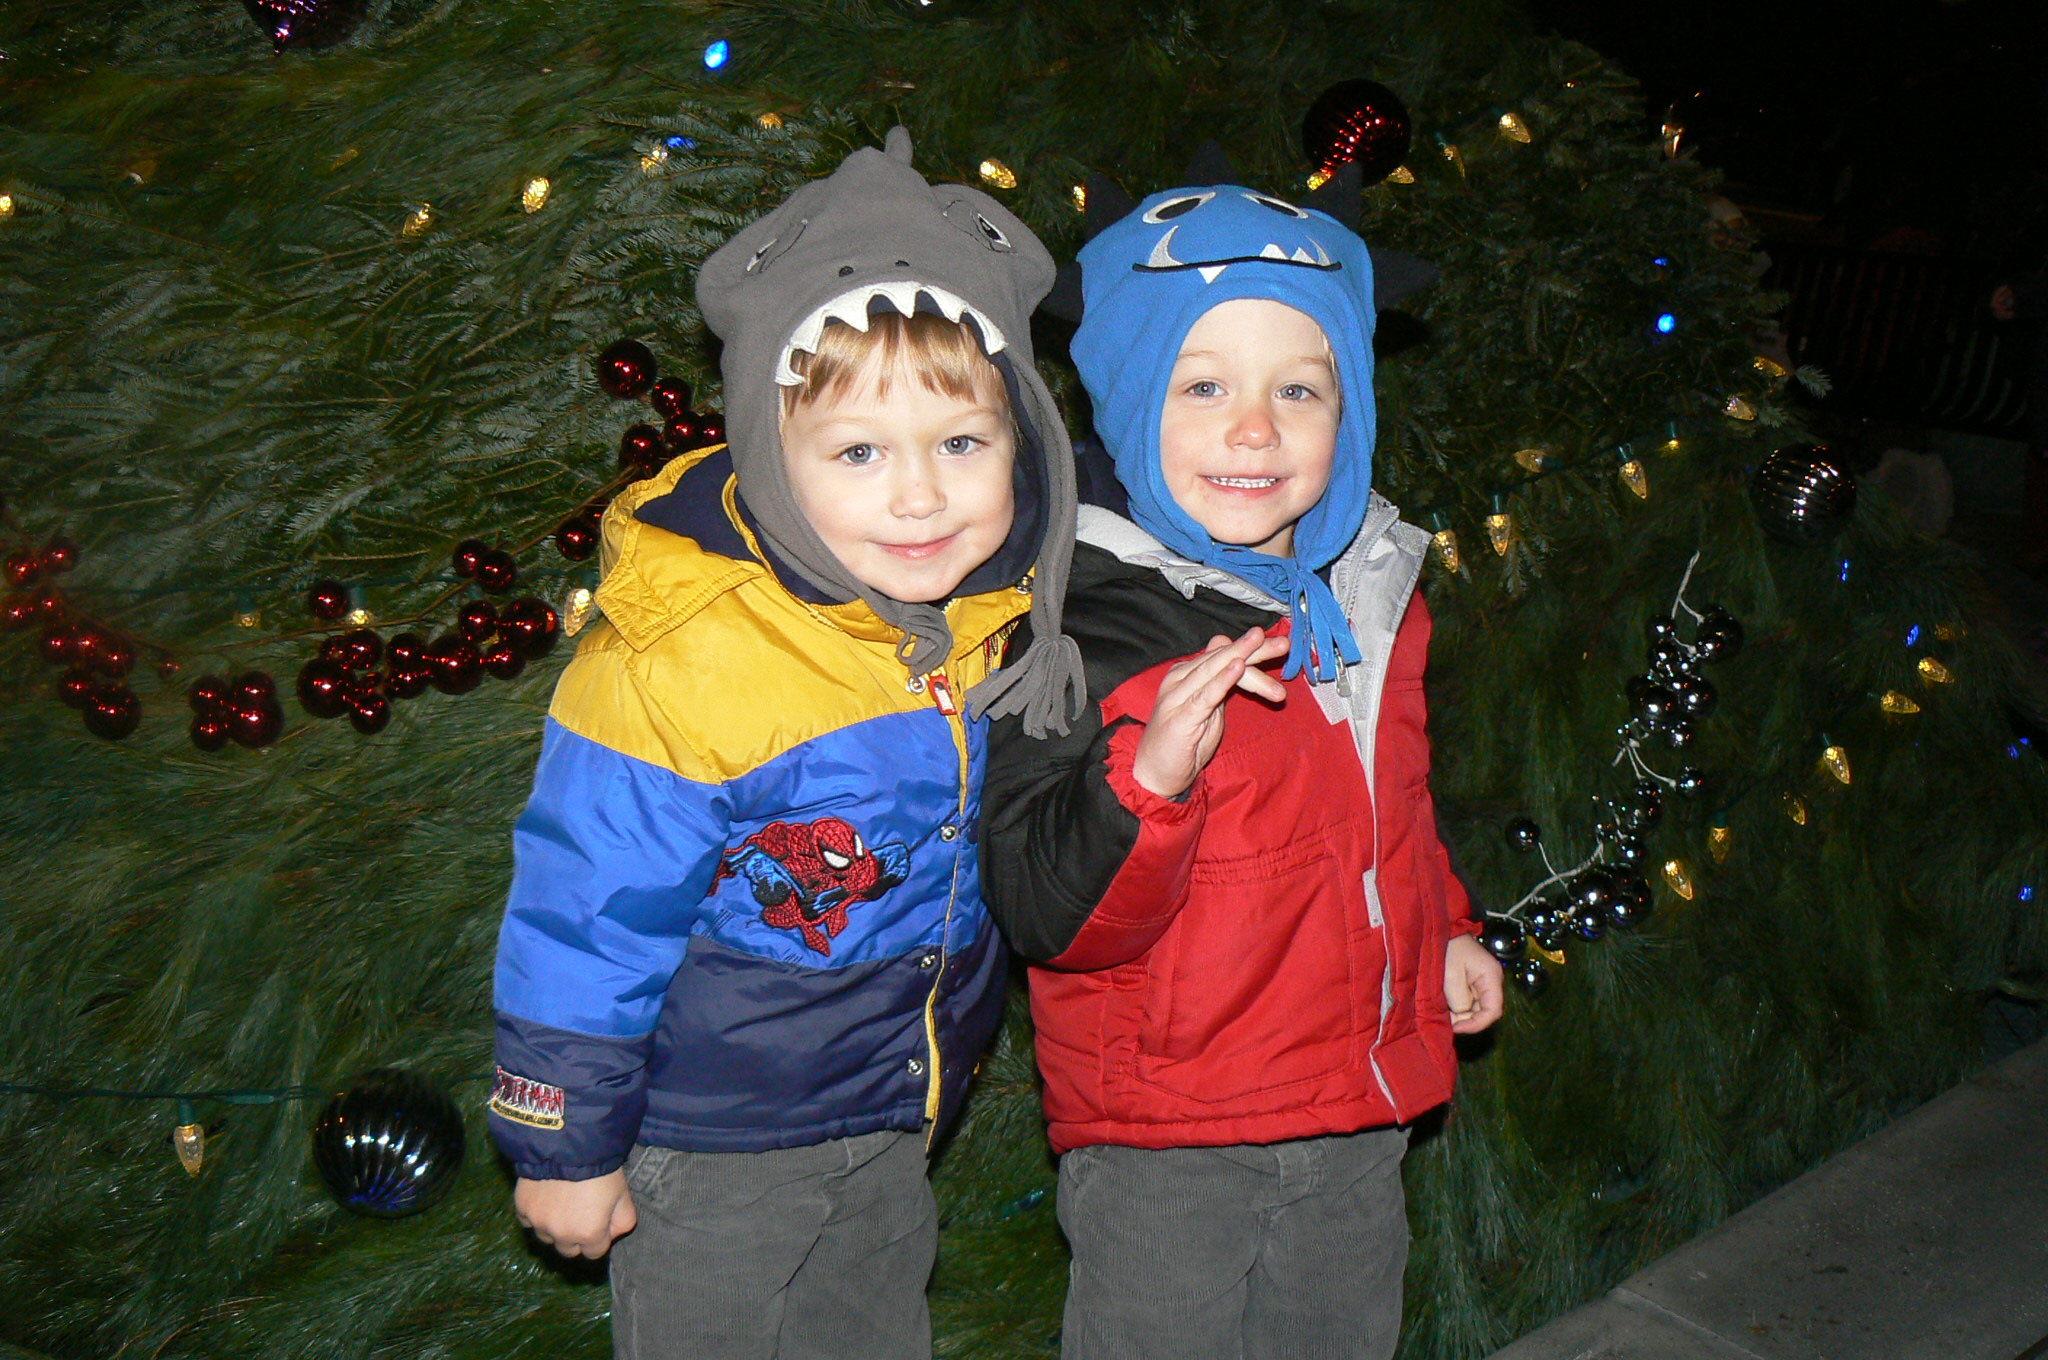 East Passyunk Avenue, Christmas Tree Light, Singing Fountain